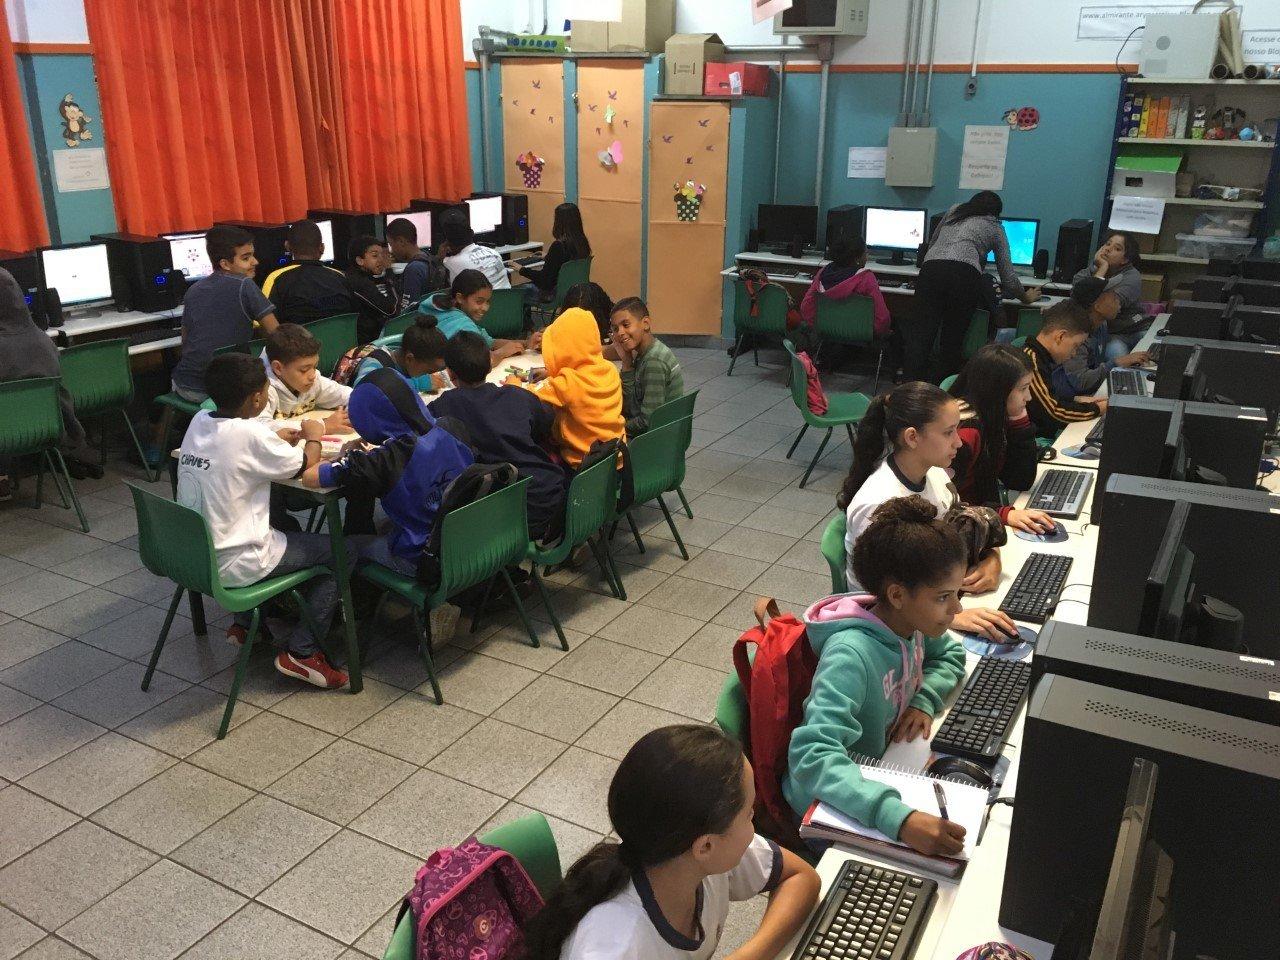 Alunos de Débora Garofalo estudando com computadores